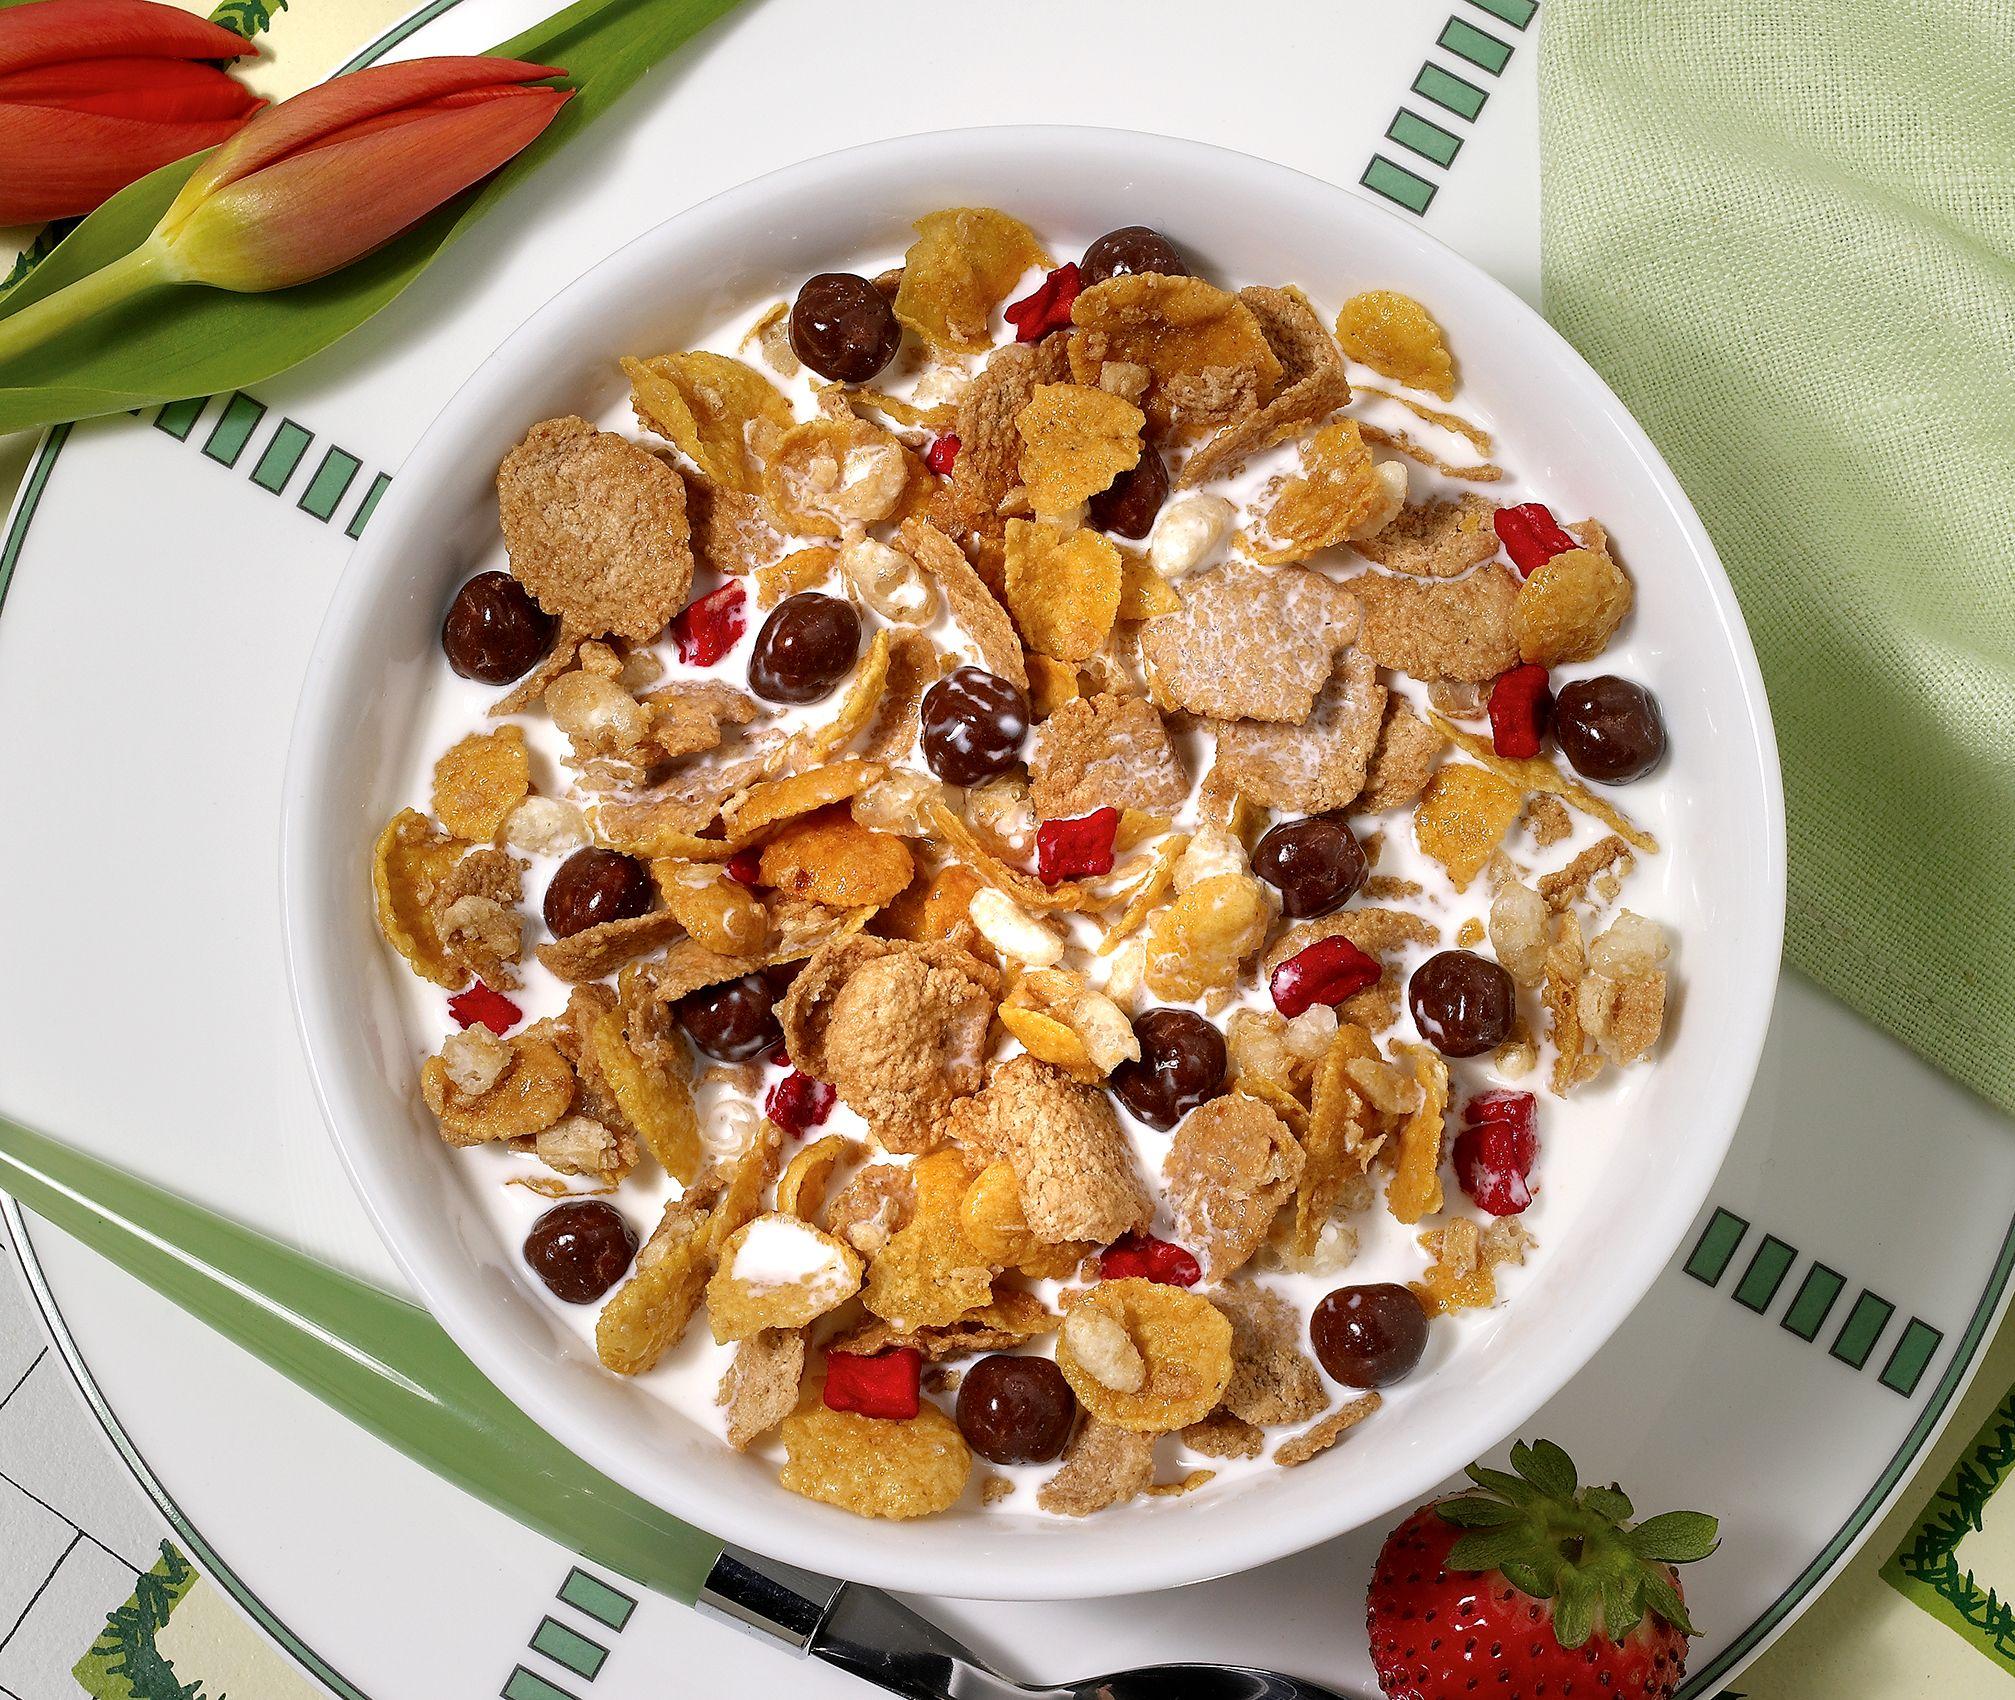 choc-crisps-cereal--9.jpg